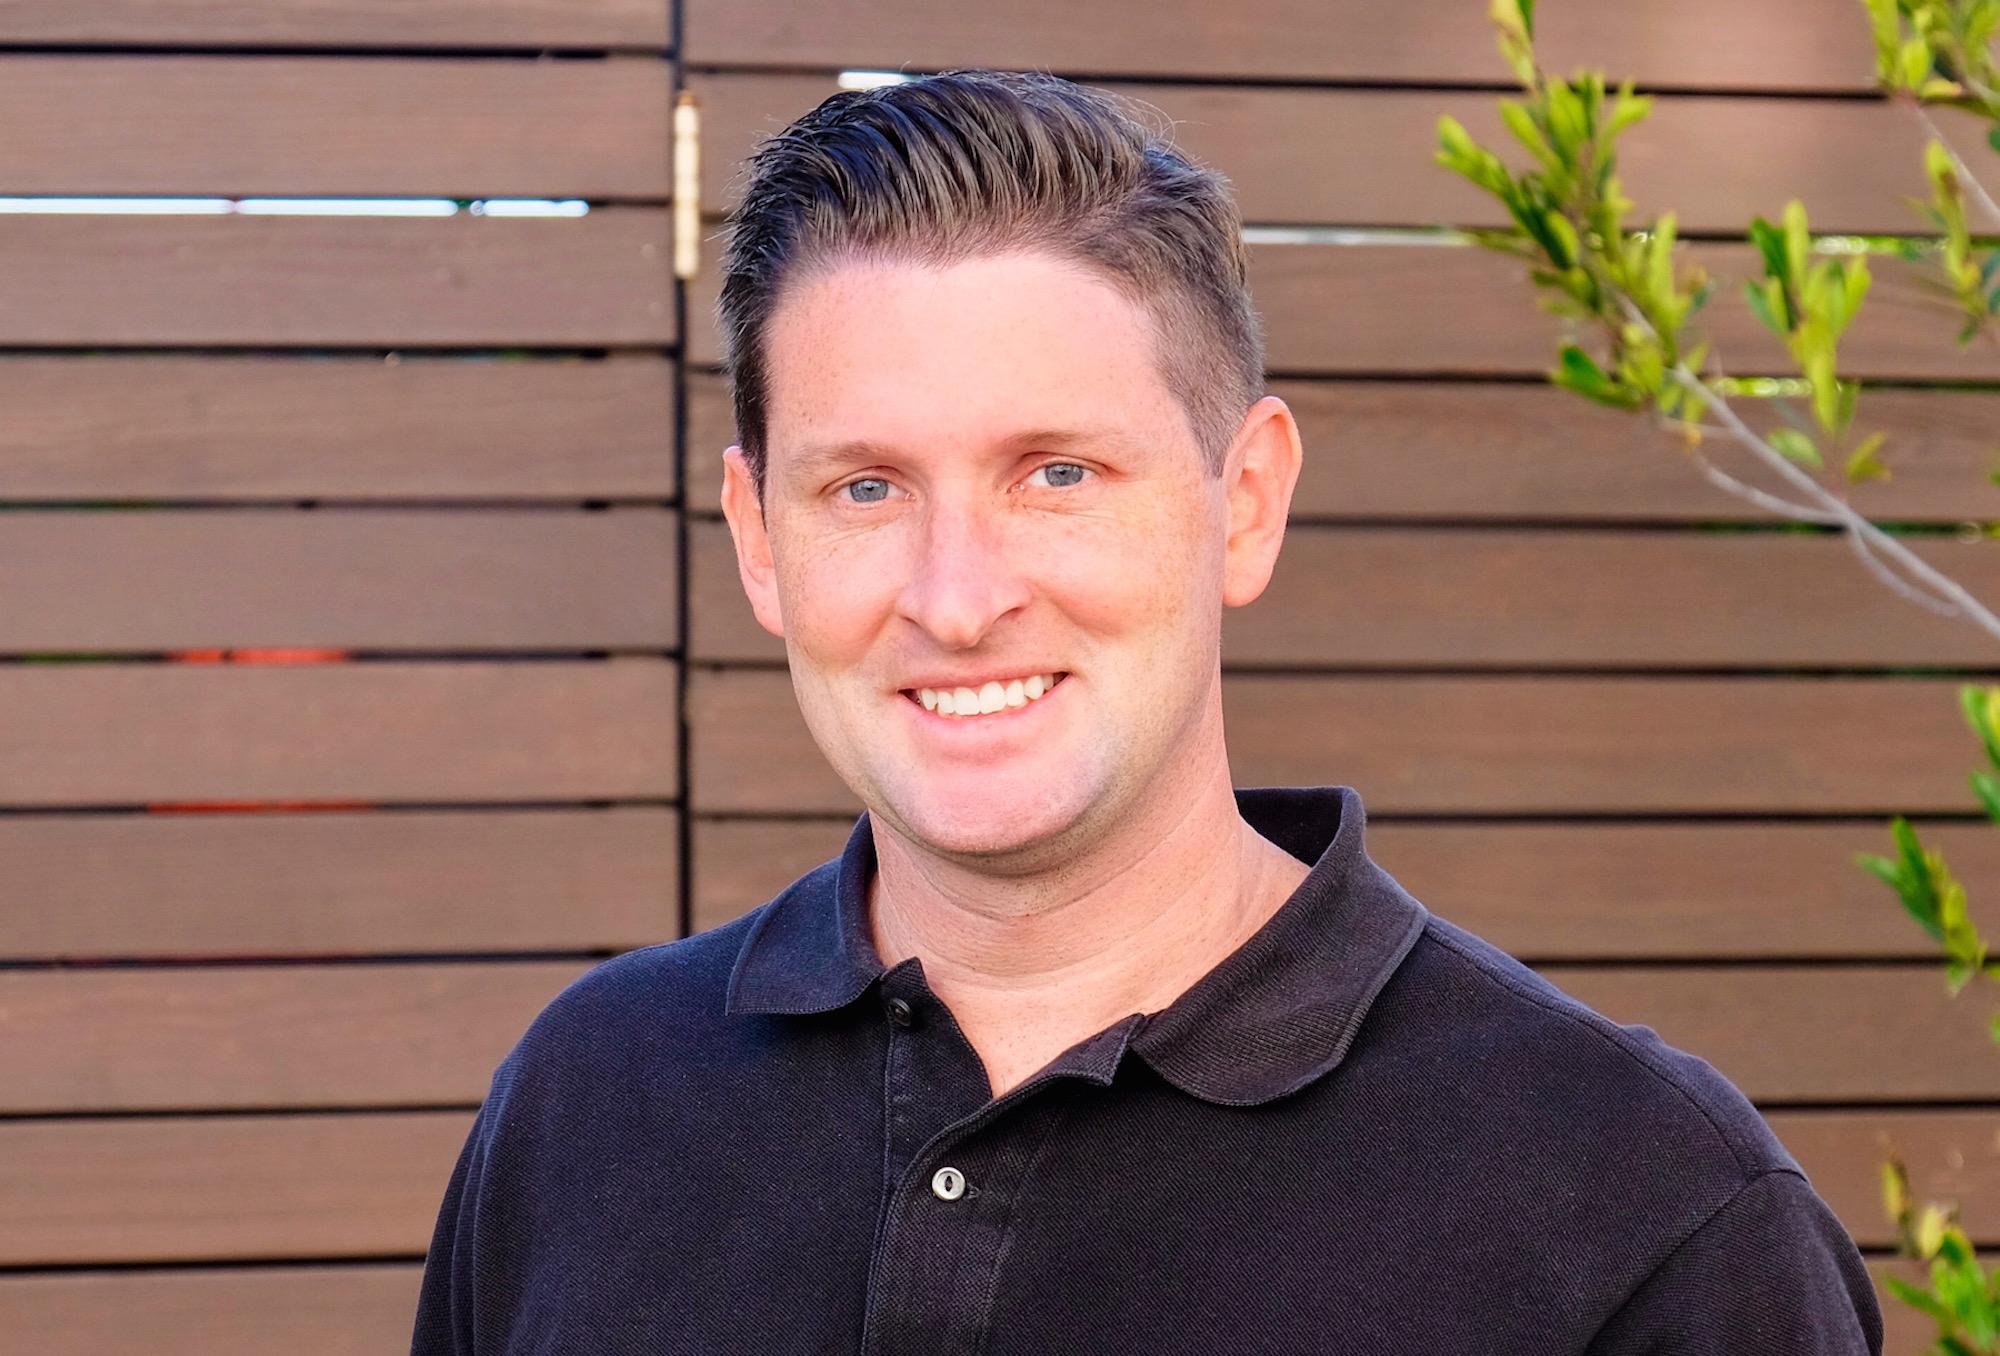 DanJohnson - Real Estate Agent